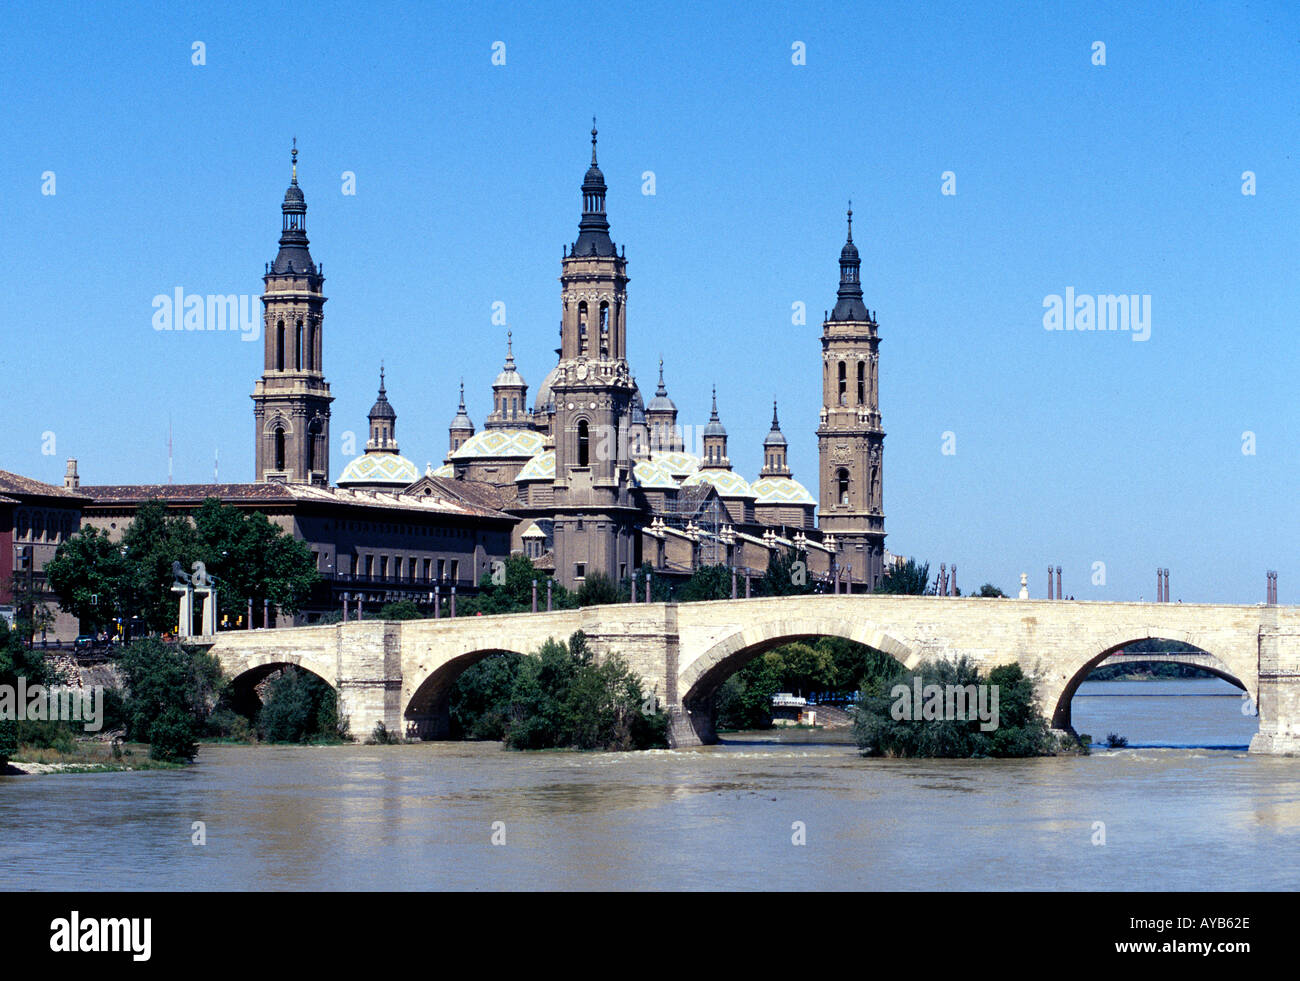 The Basilica Pilar at Zaragoza Spain - Stock Image